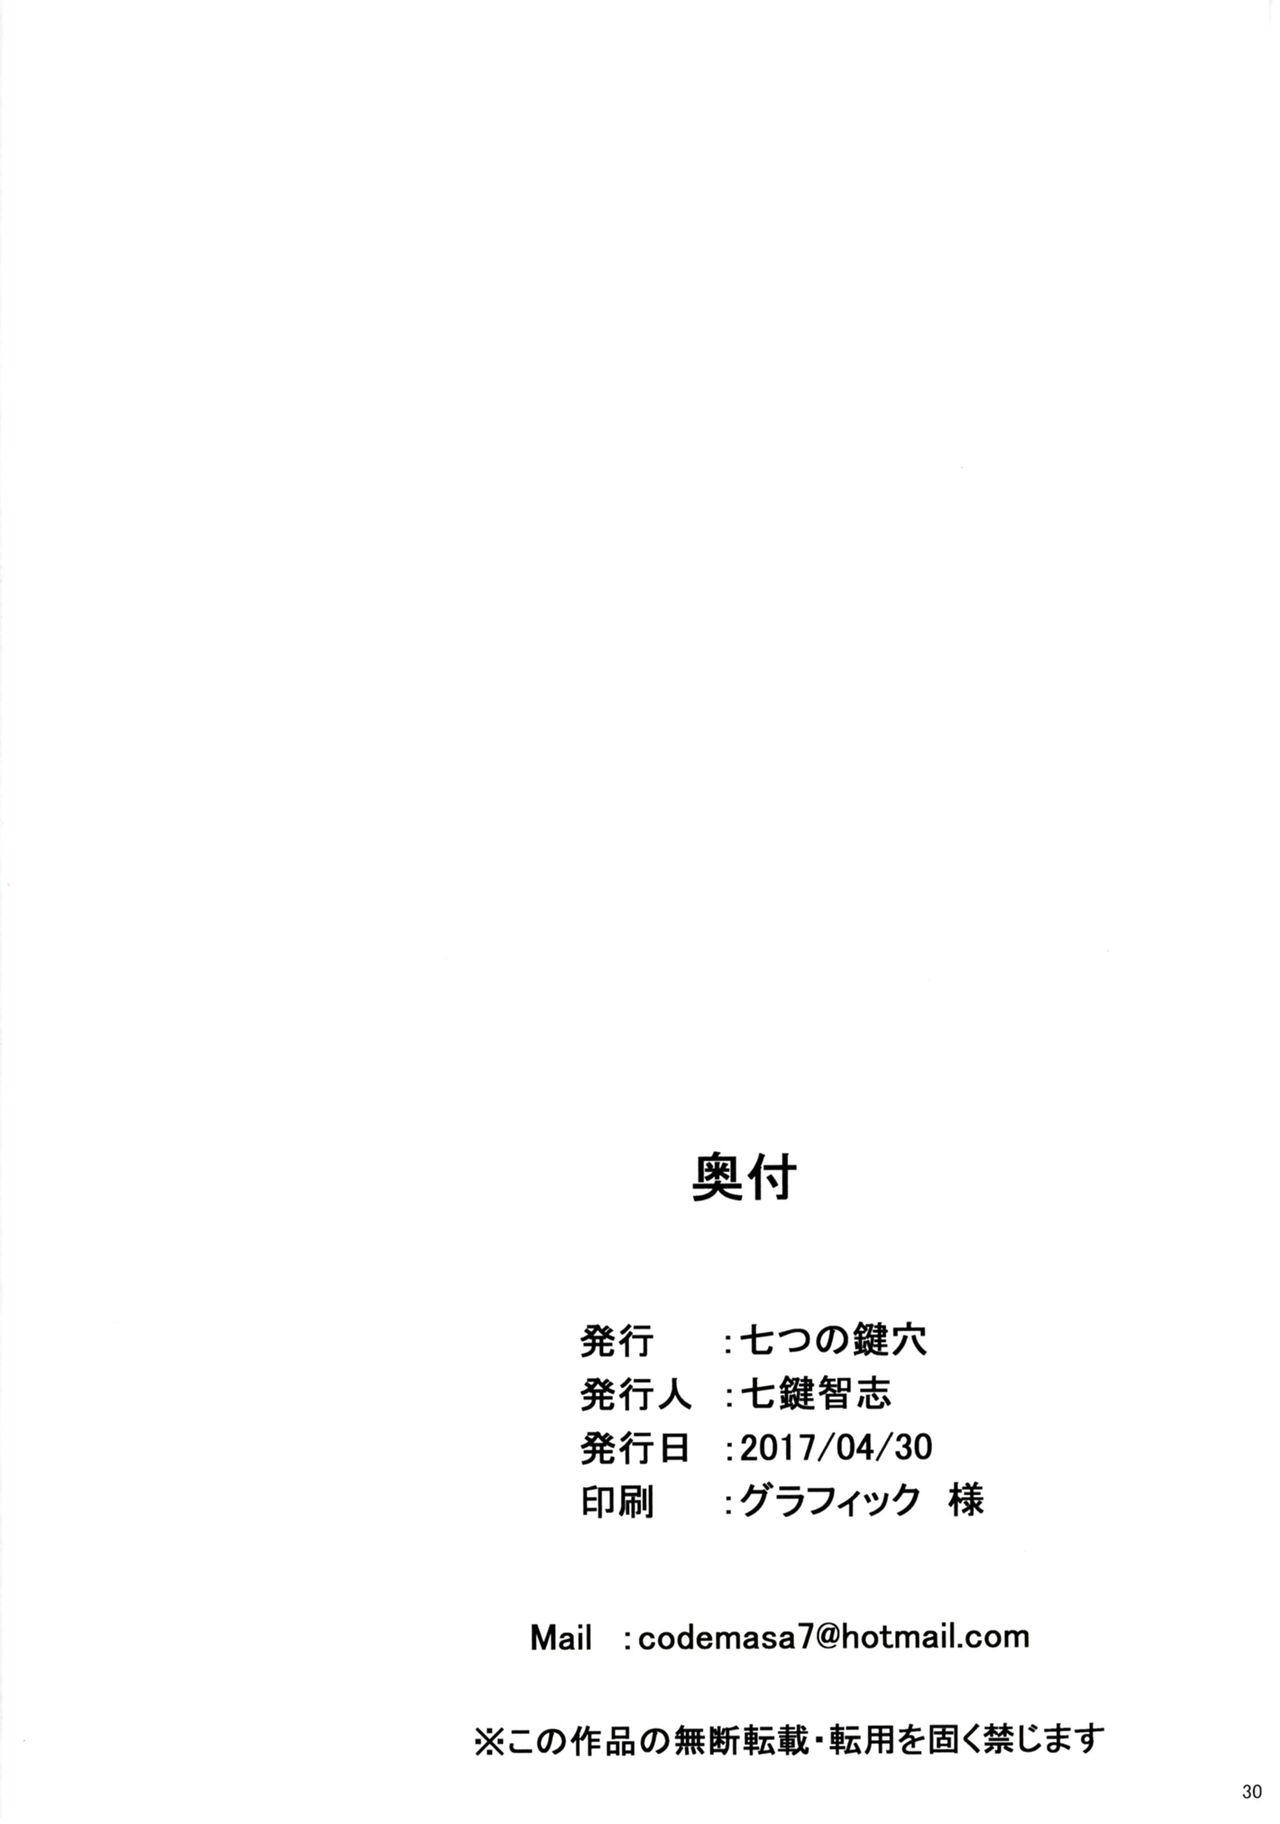 Gal Shota Cinderella 4 28